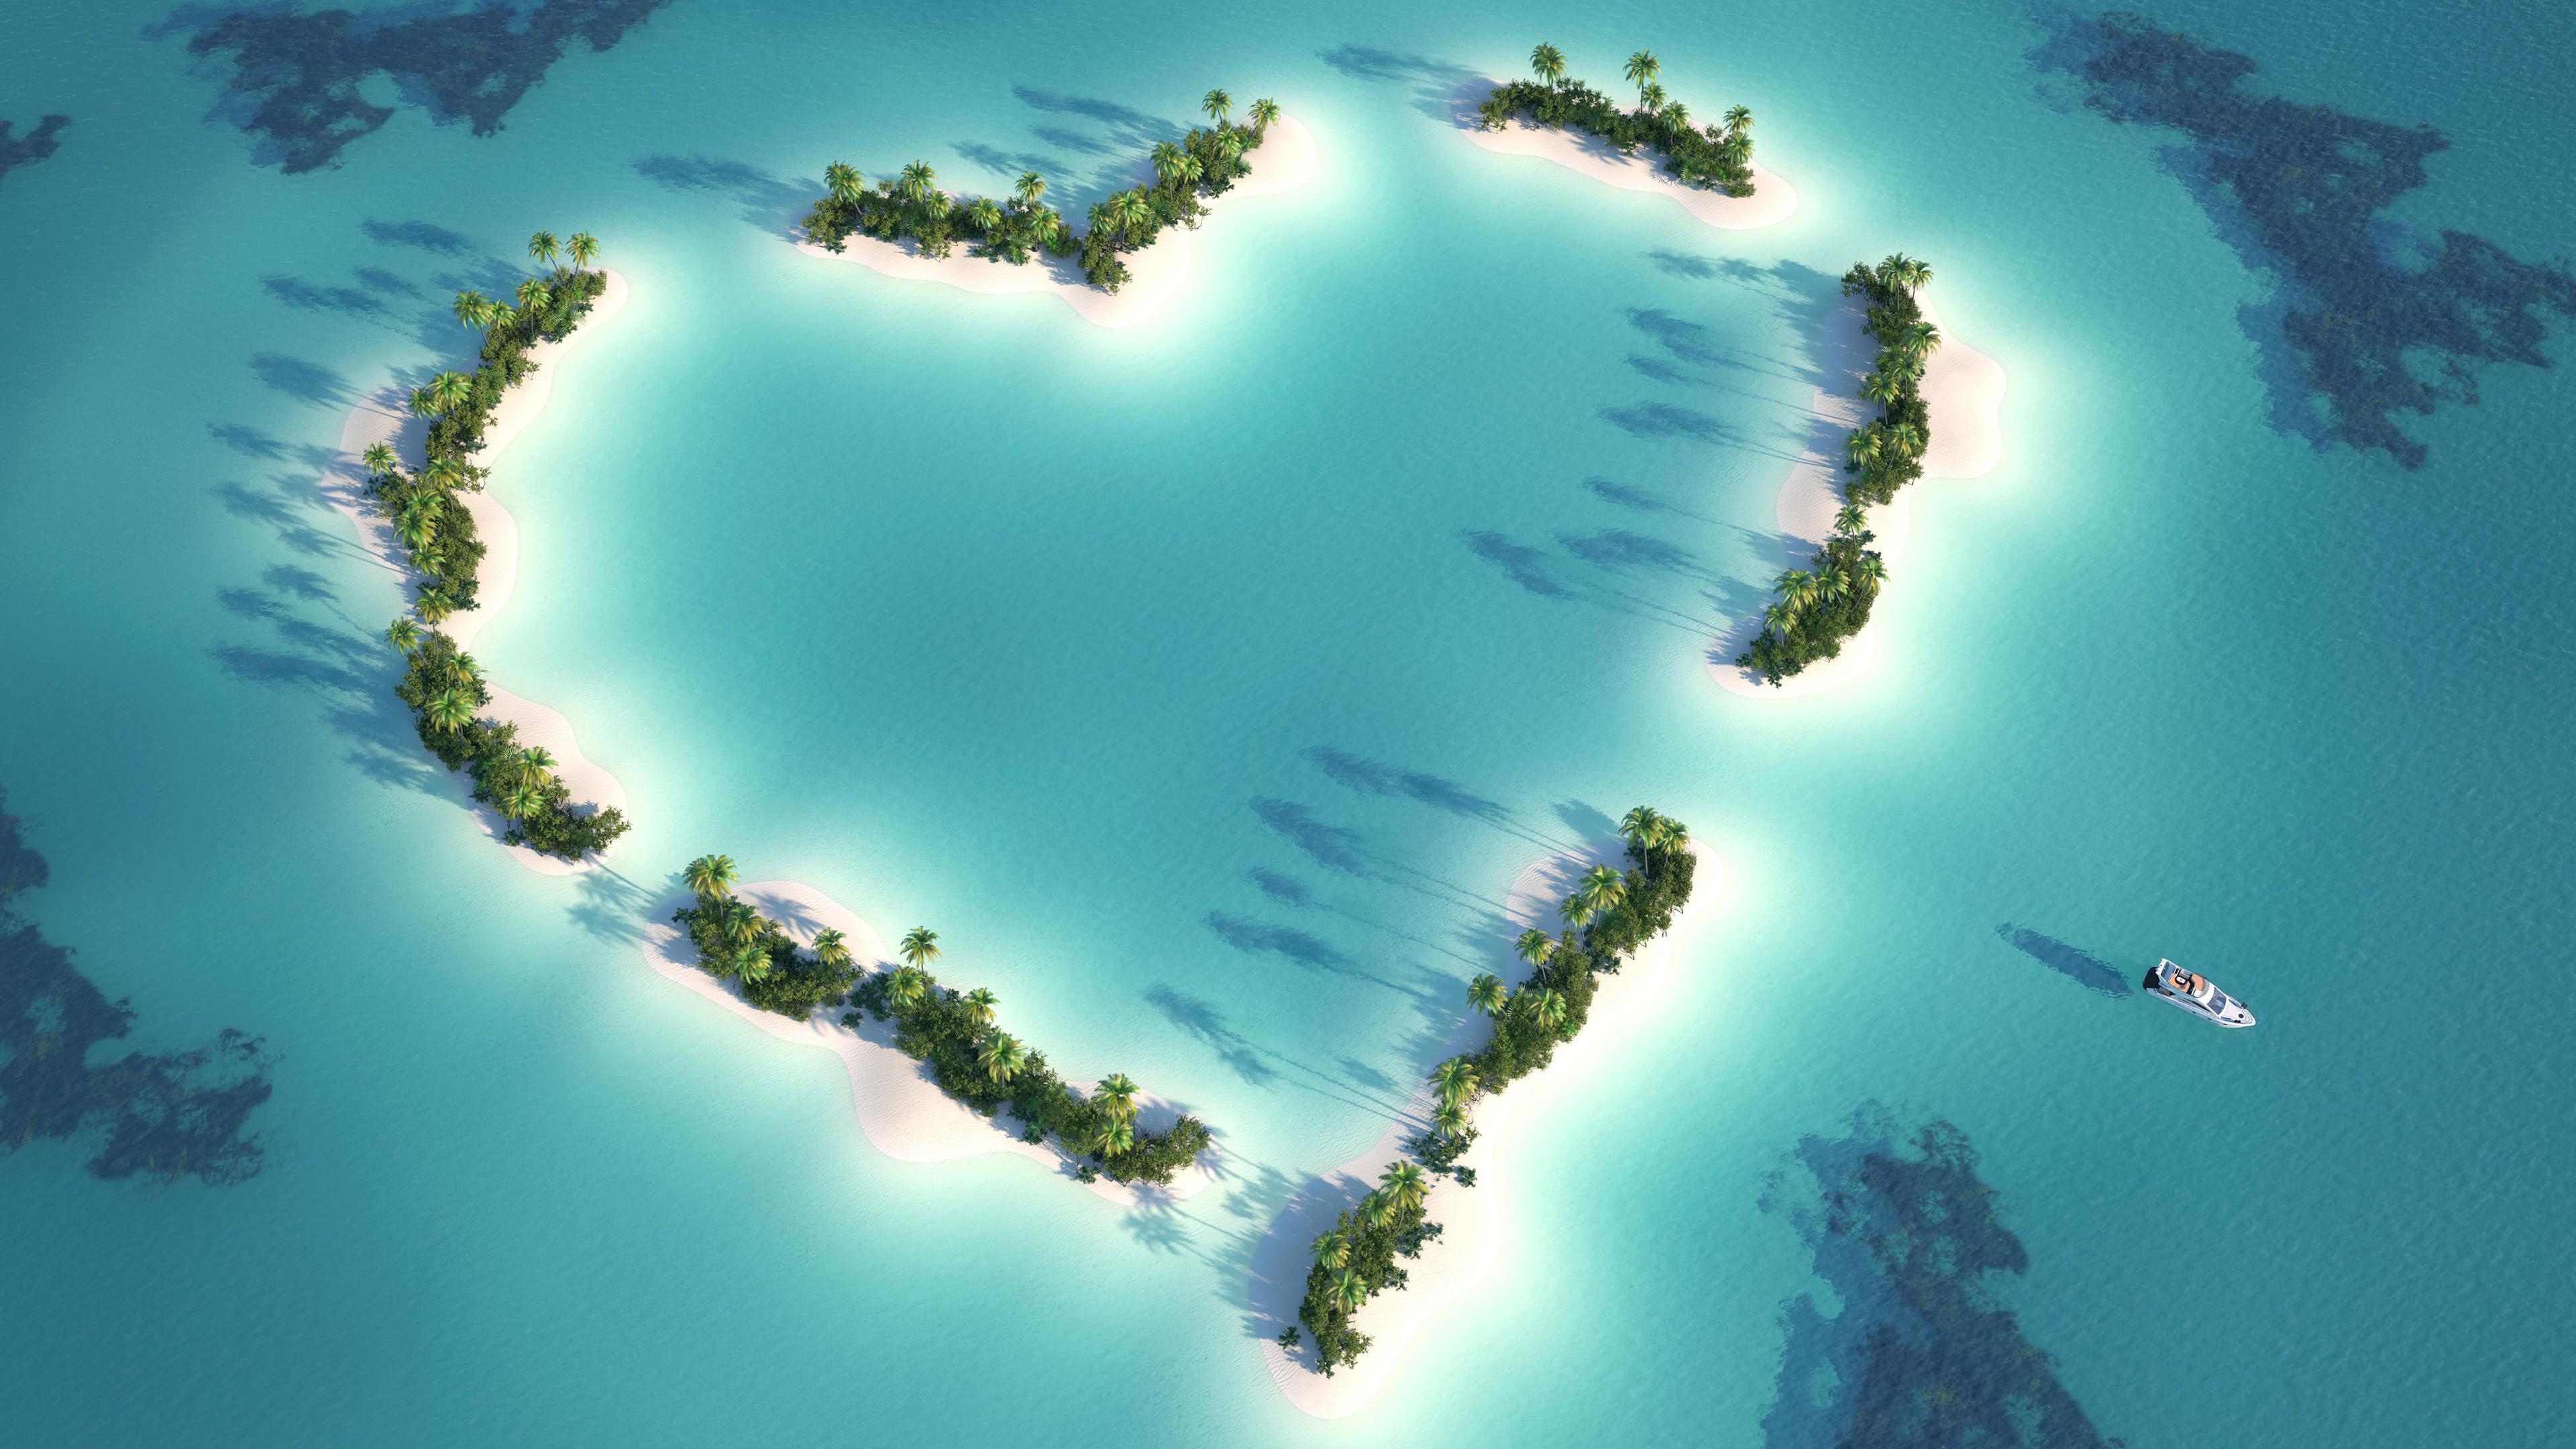 heart island uhd 4k wallpaper